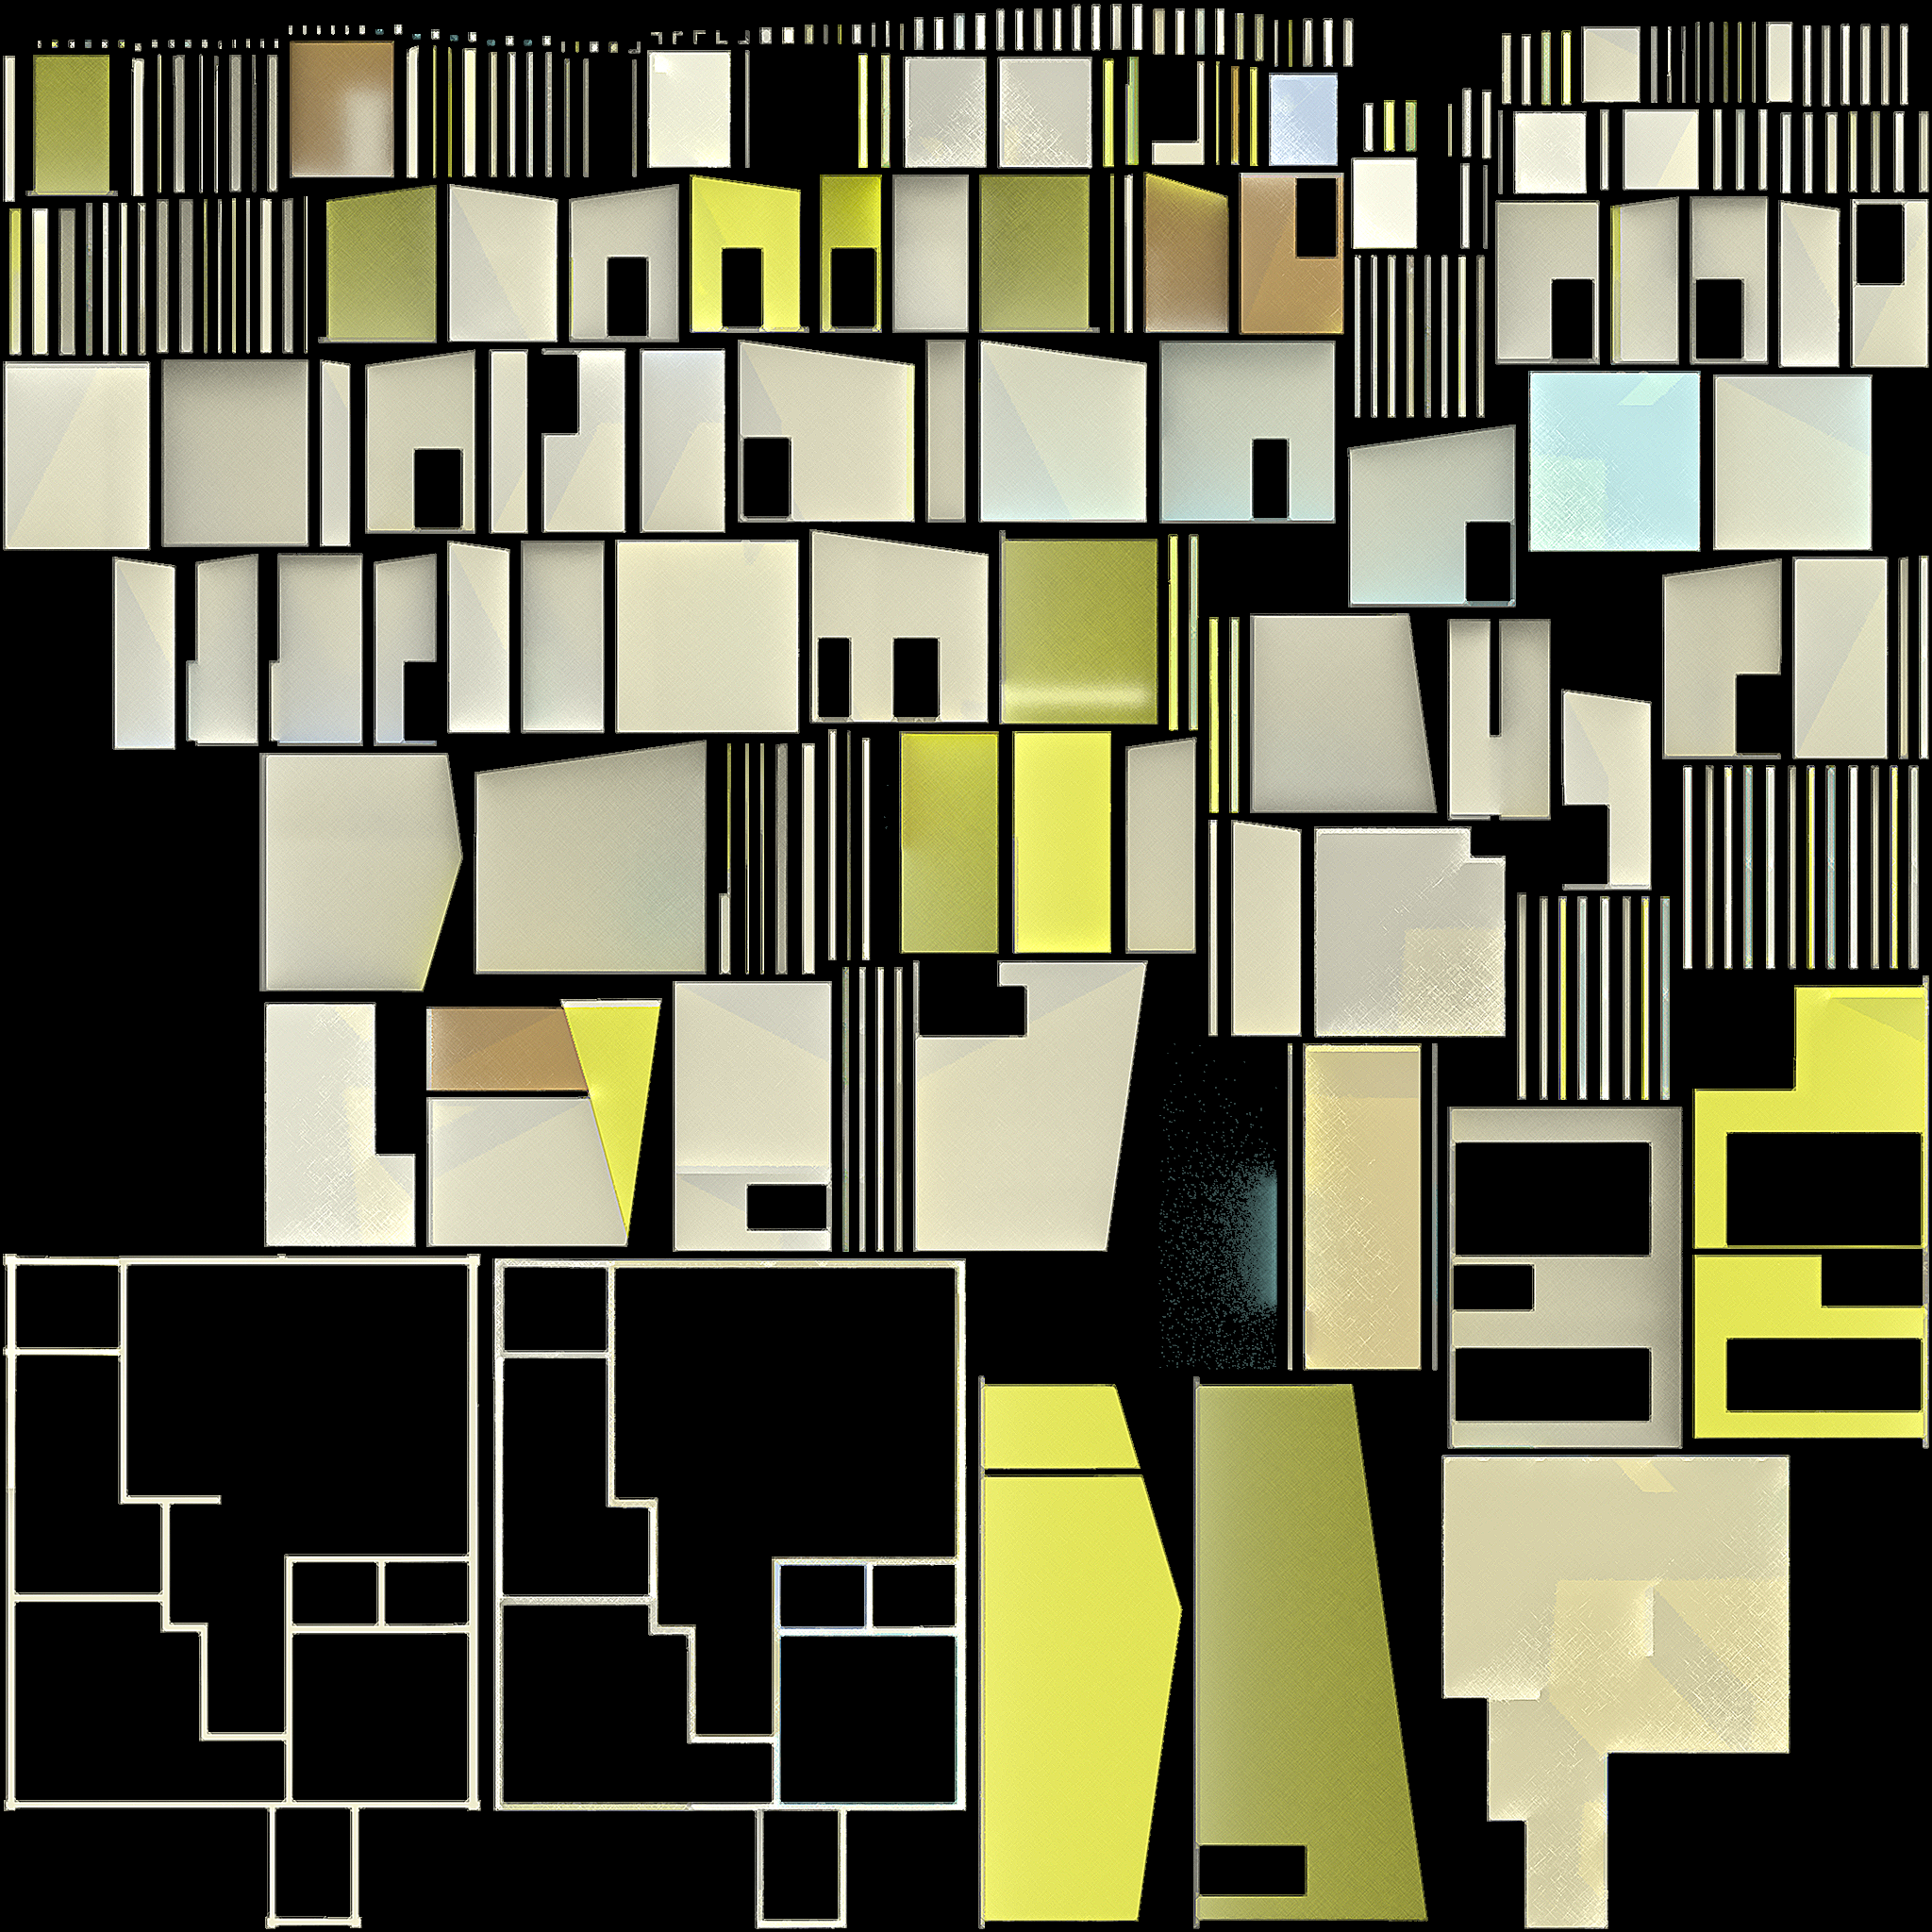 HomeAutomation/uip/House/maps/houseShape.png